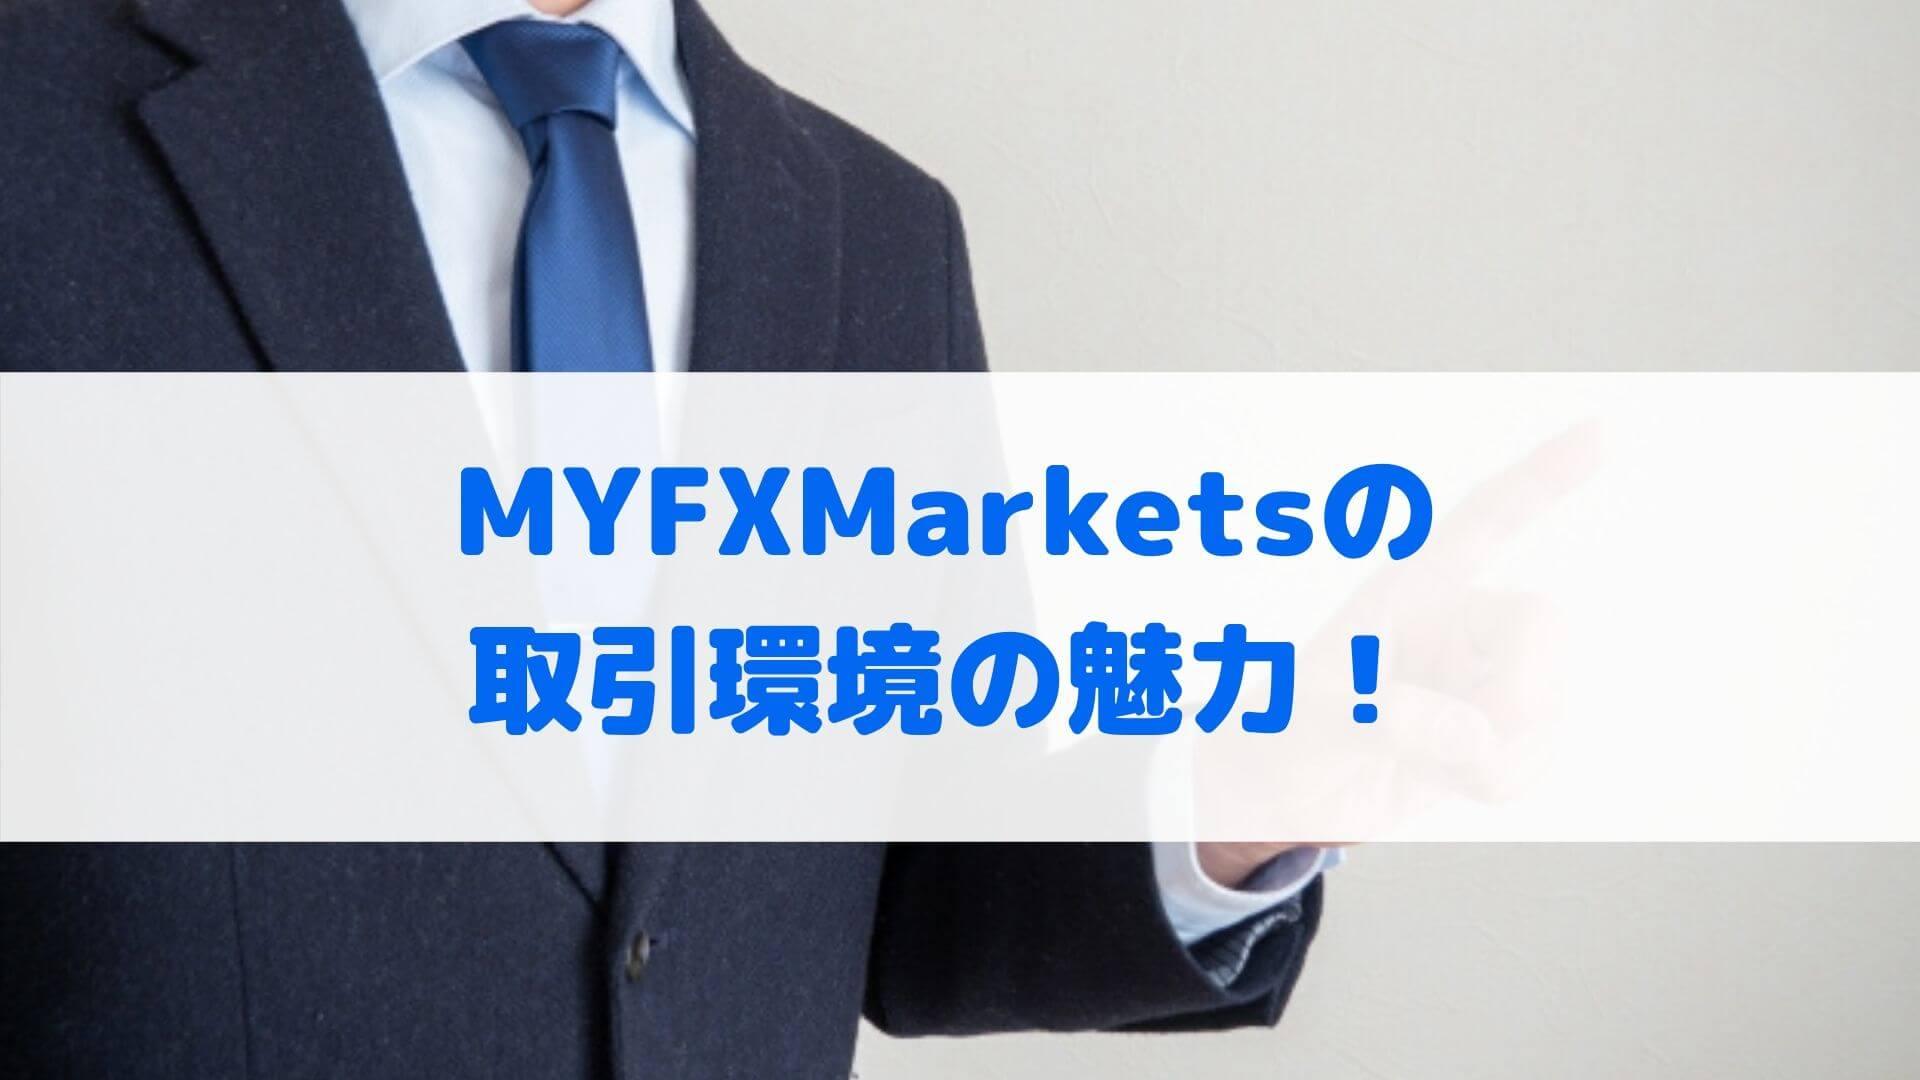 MYFXMarkets ボーナス